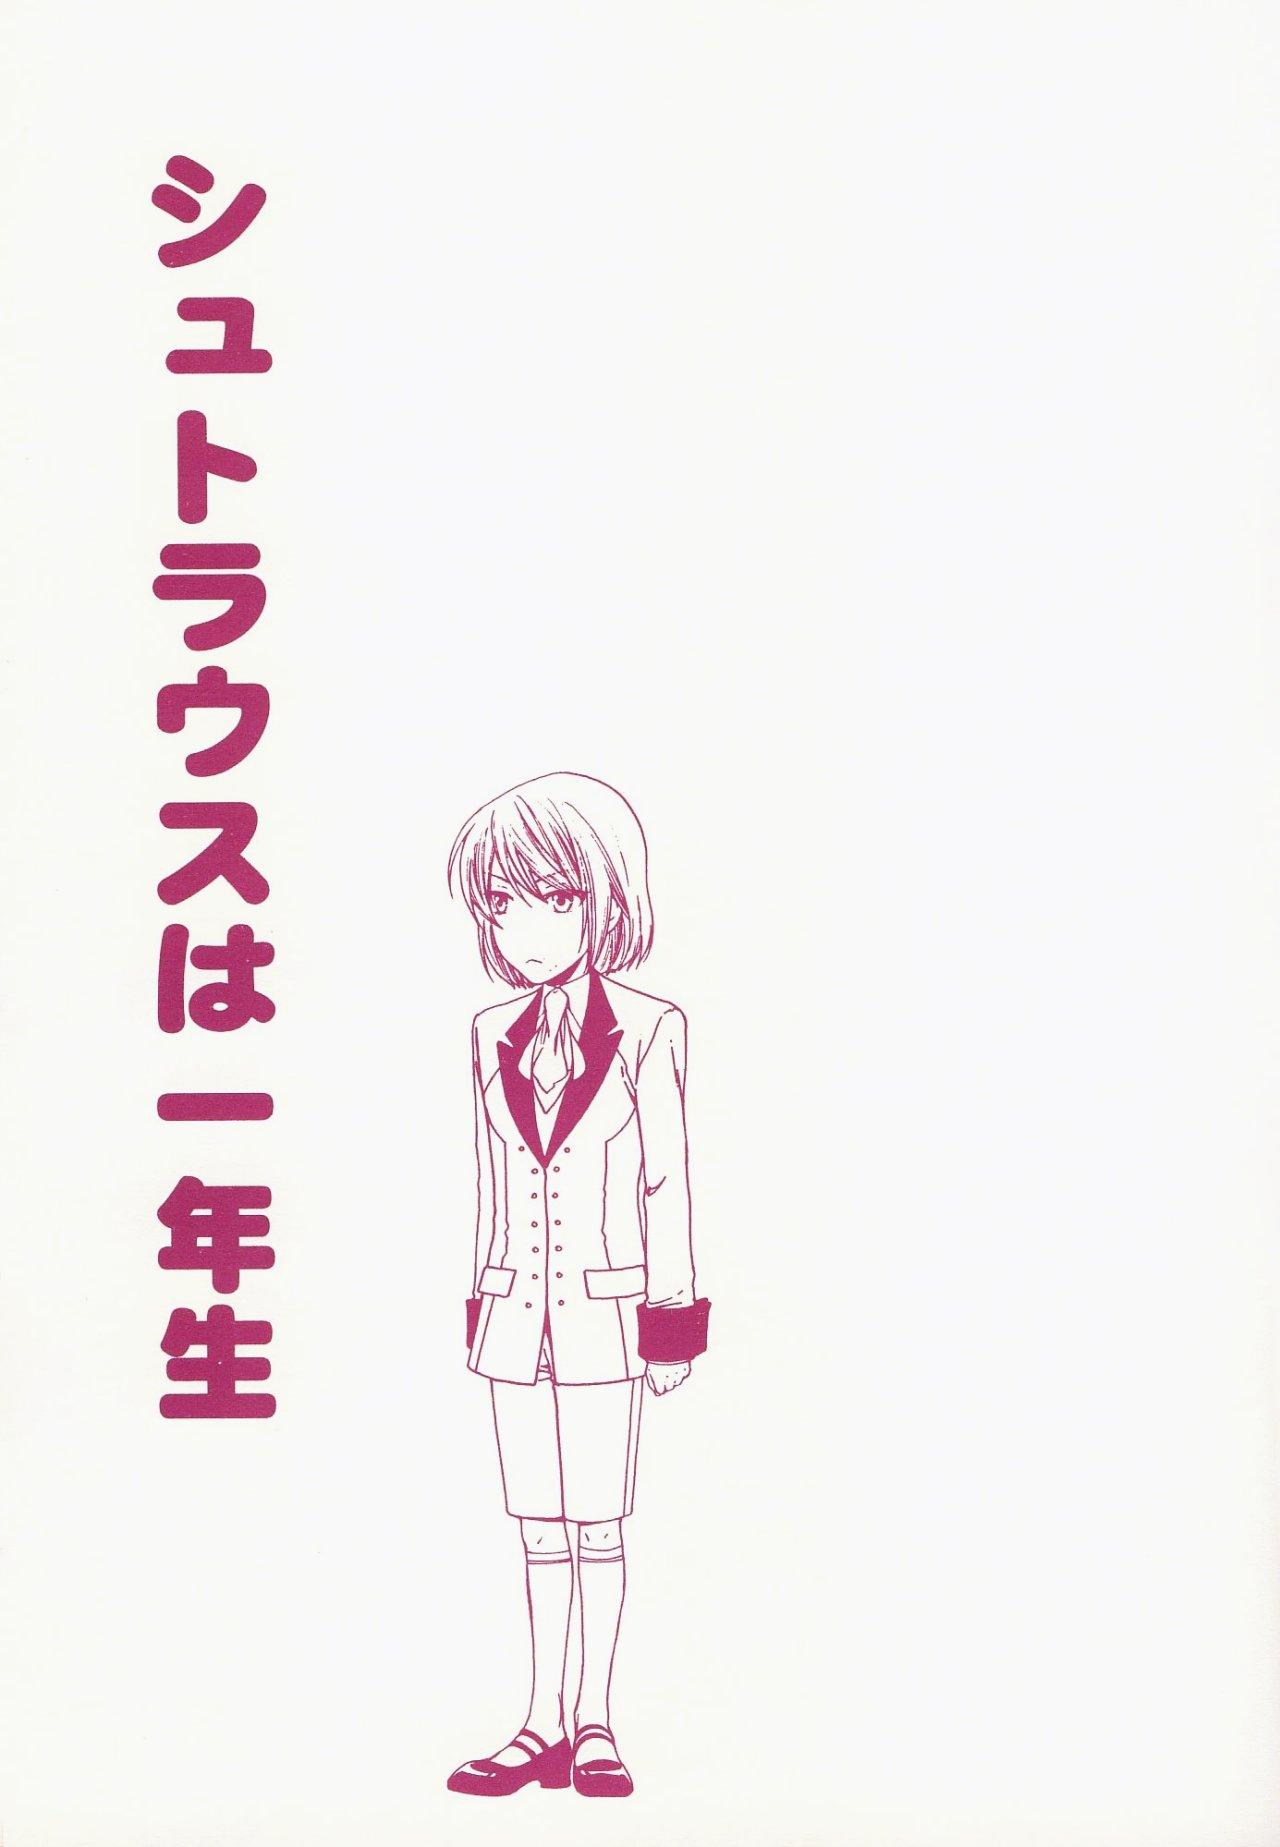 https://c10.mangatag.com/es_manga/pic5/32/19616/789308/876a8cc9b9e7e41dc4e2a565ce31dcd4.jpg Page 3